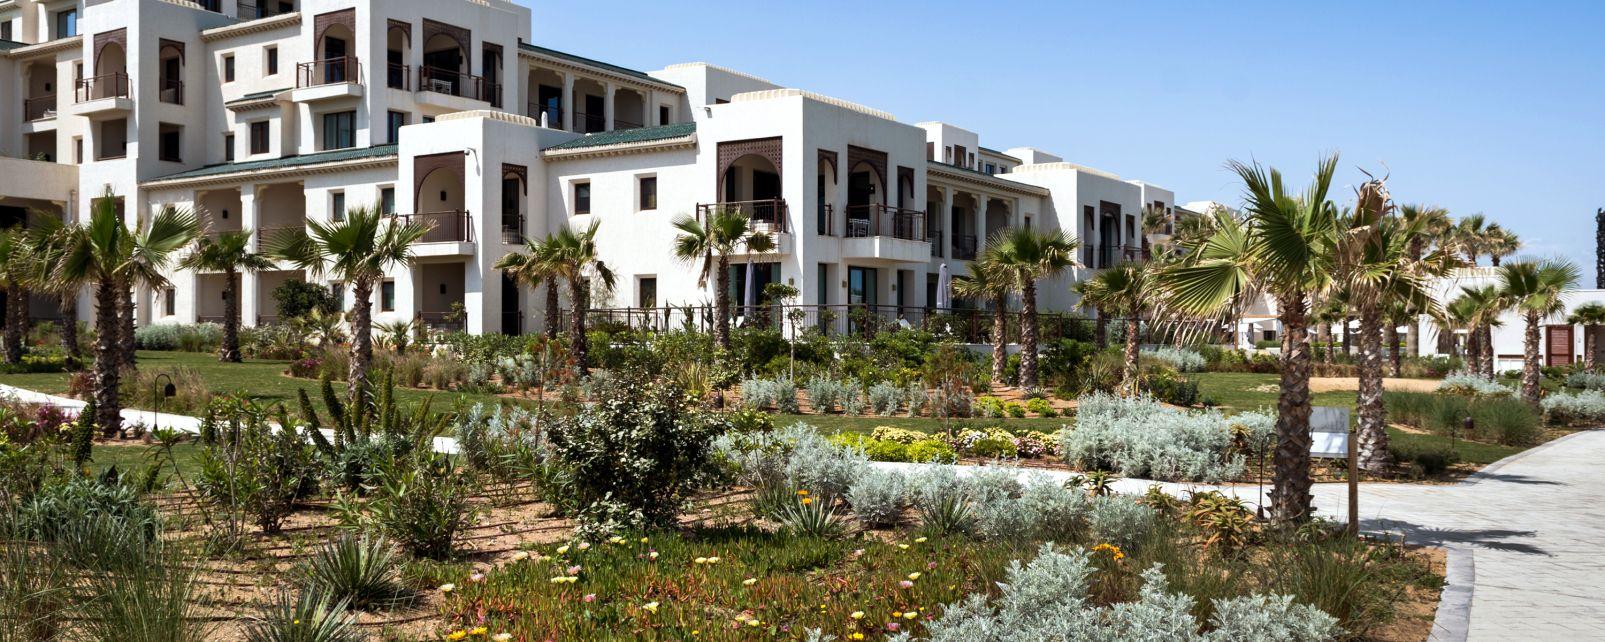 Hôtel Four Seasons Tunis